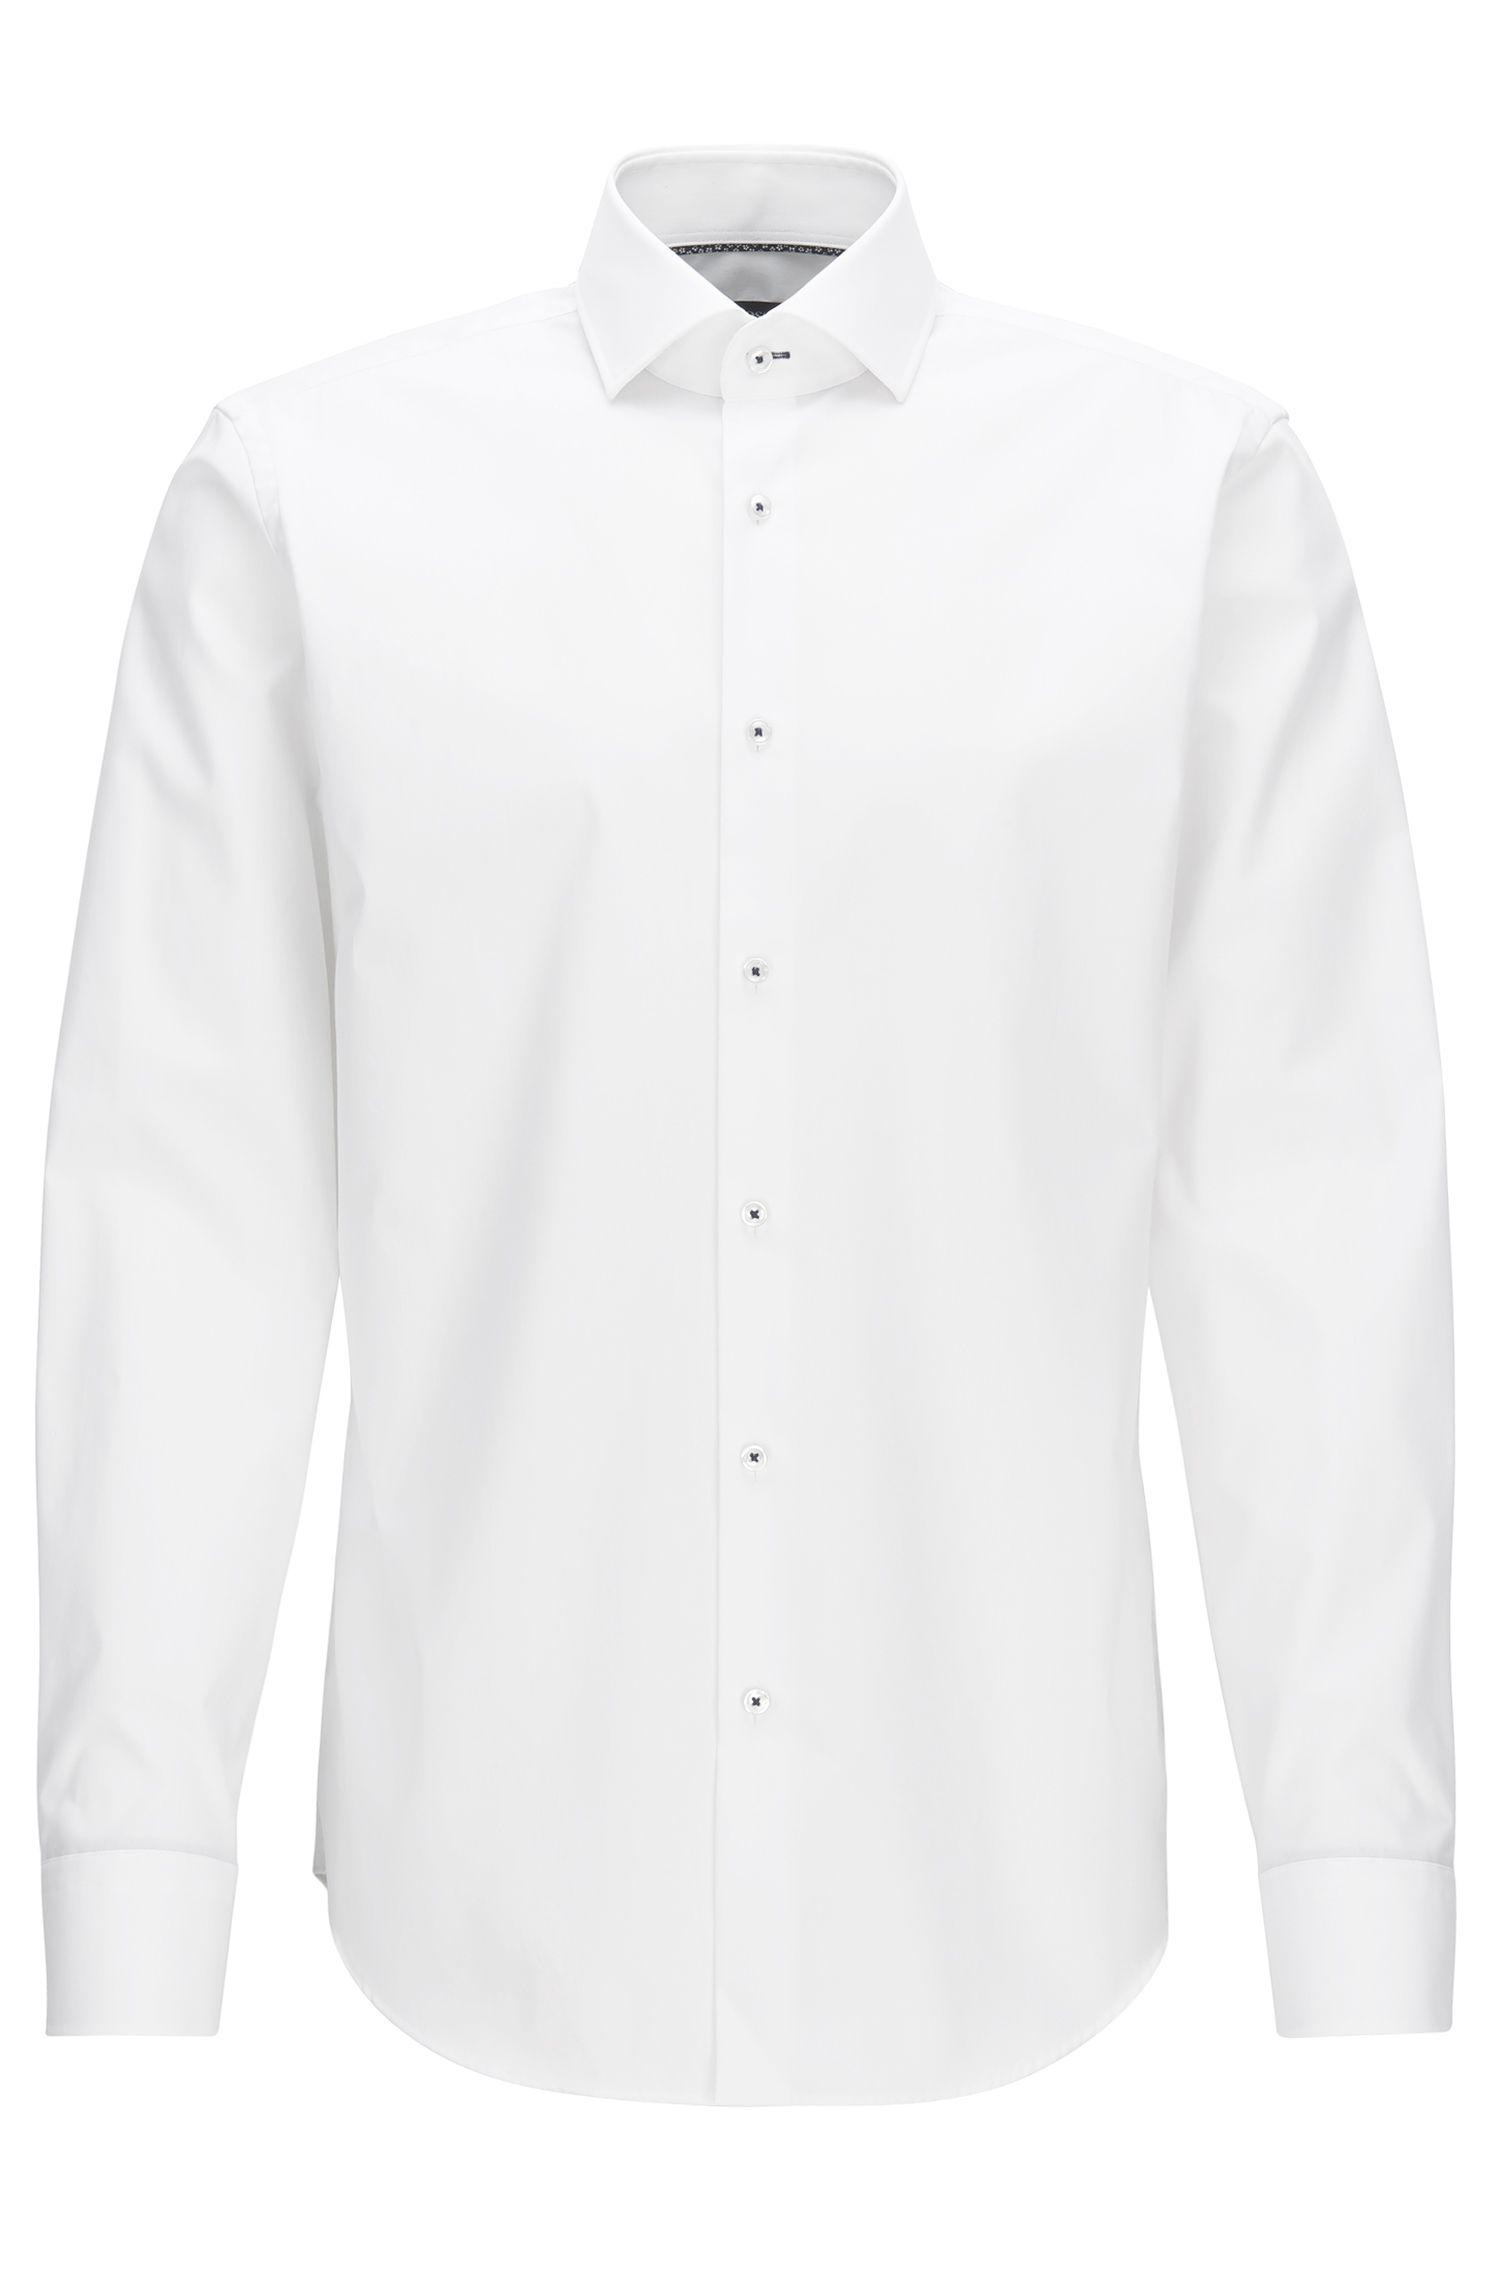 Easy-Iron Cotton Dress Shirt, Regular Fit | Glent